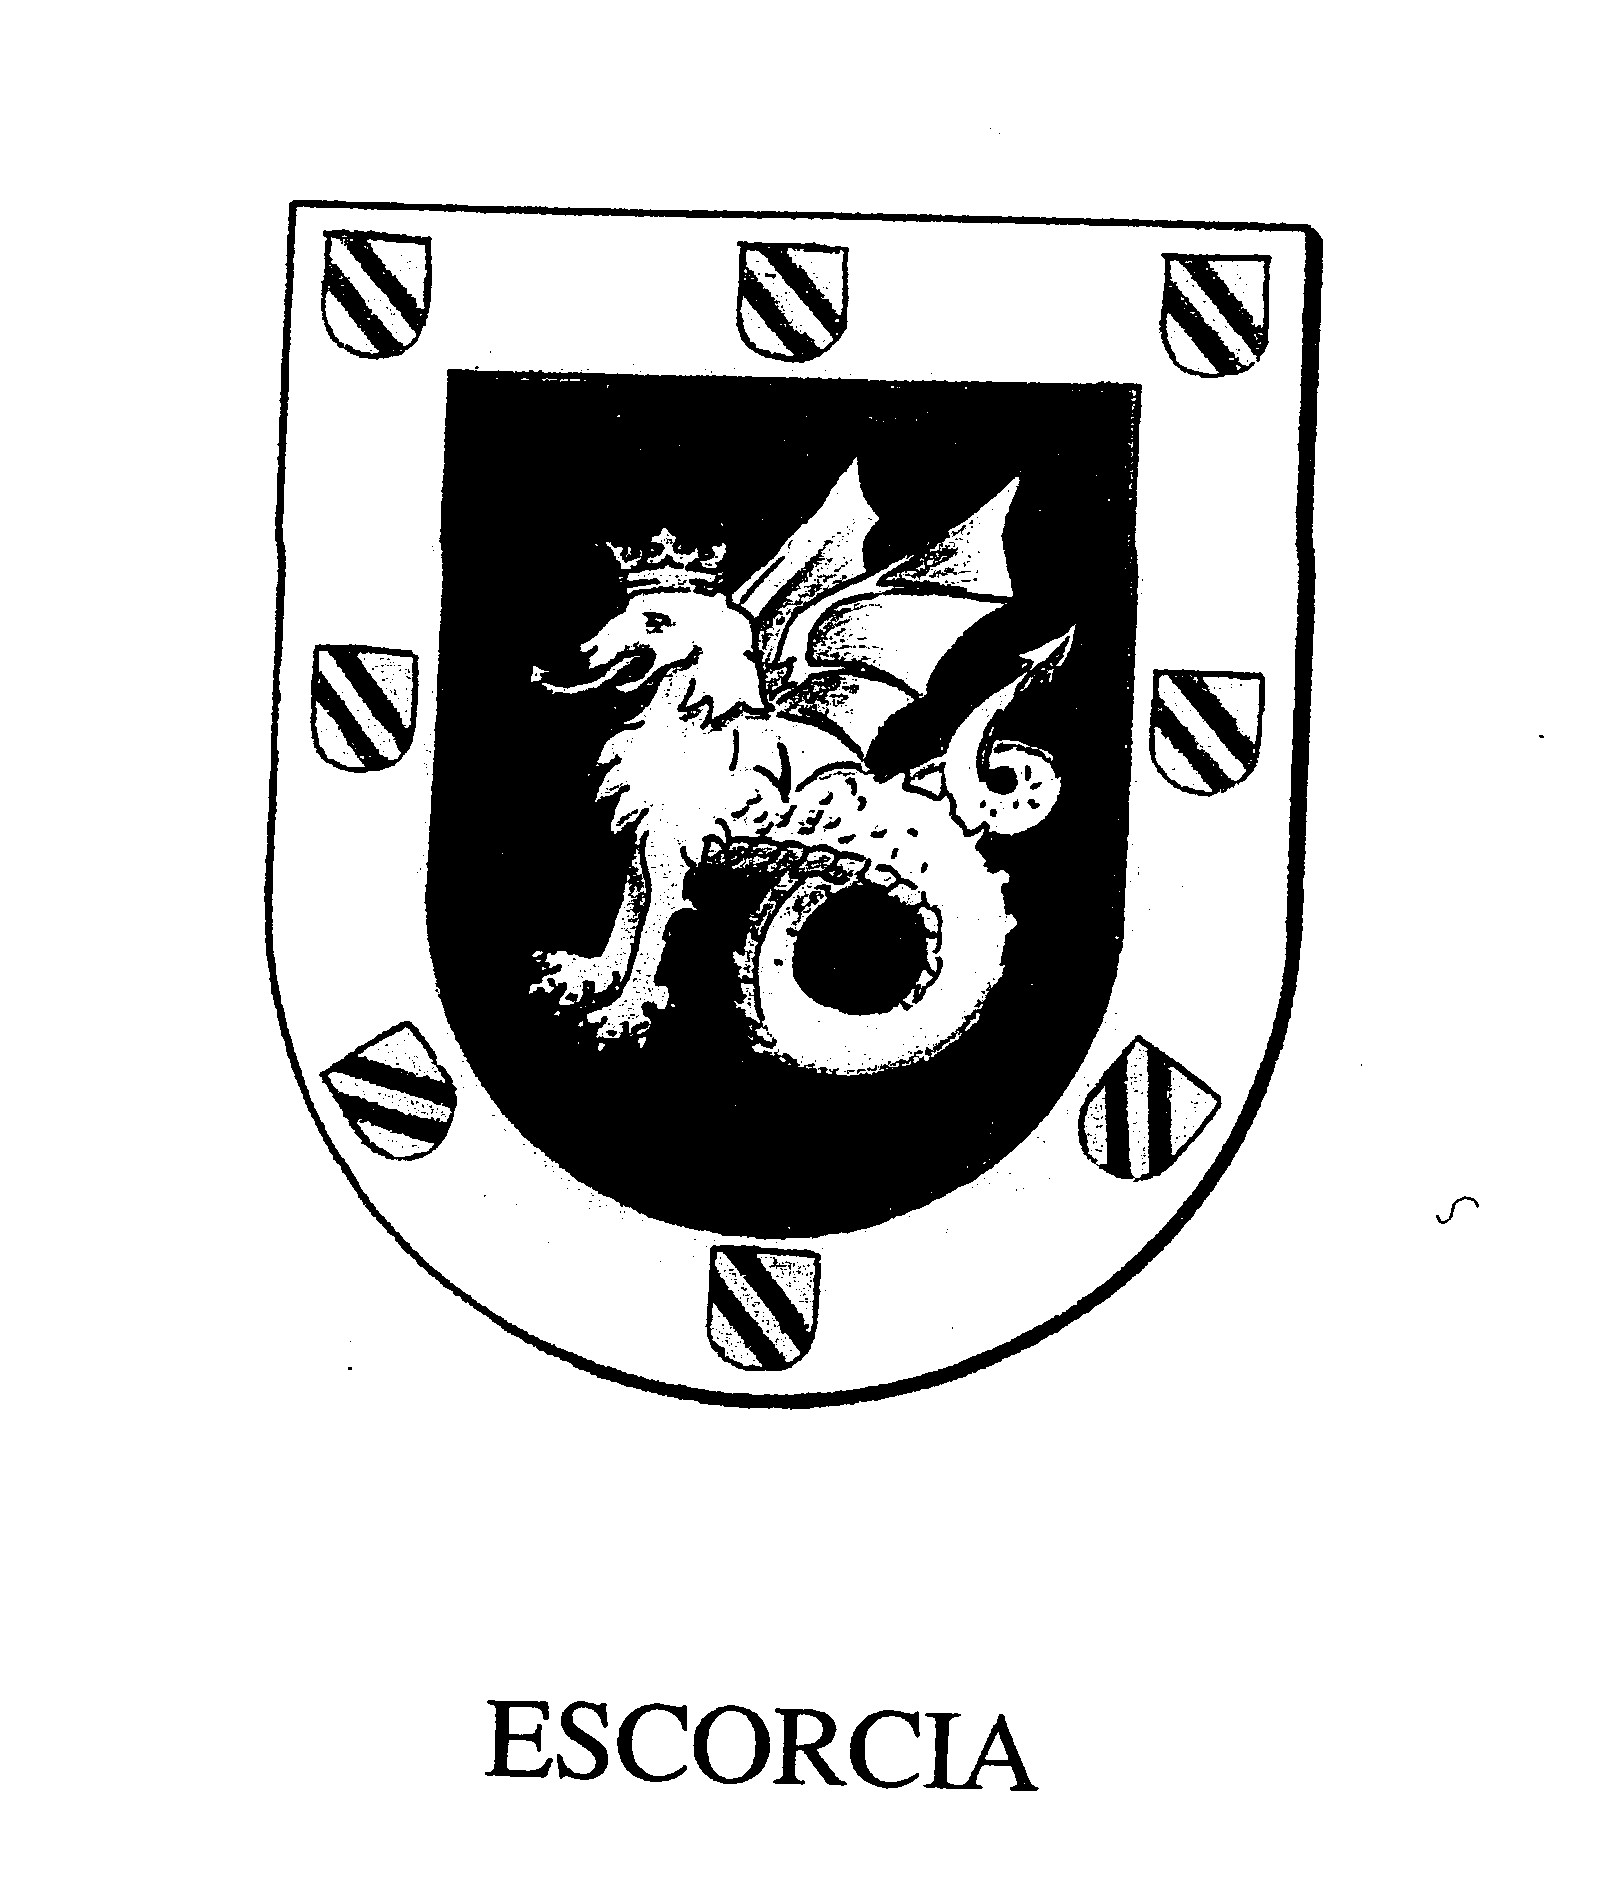 Stemma Escorcia